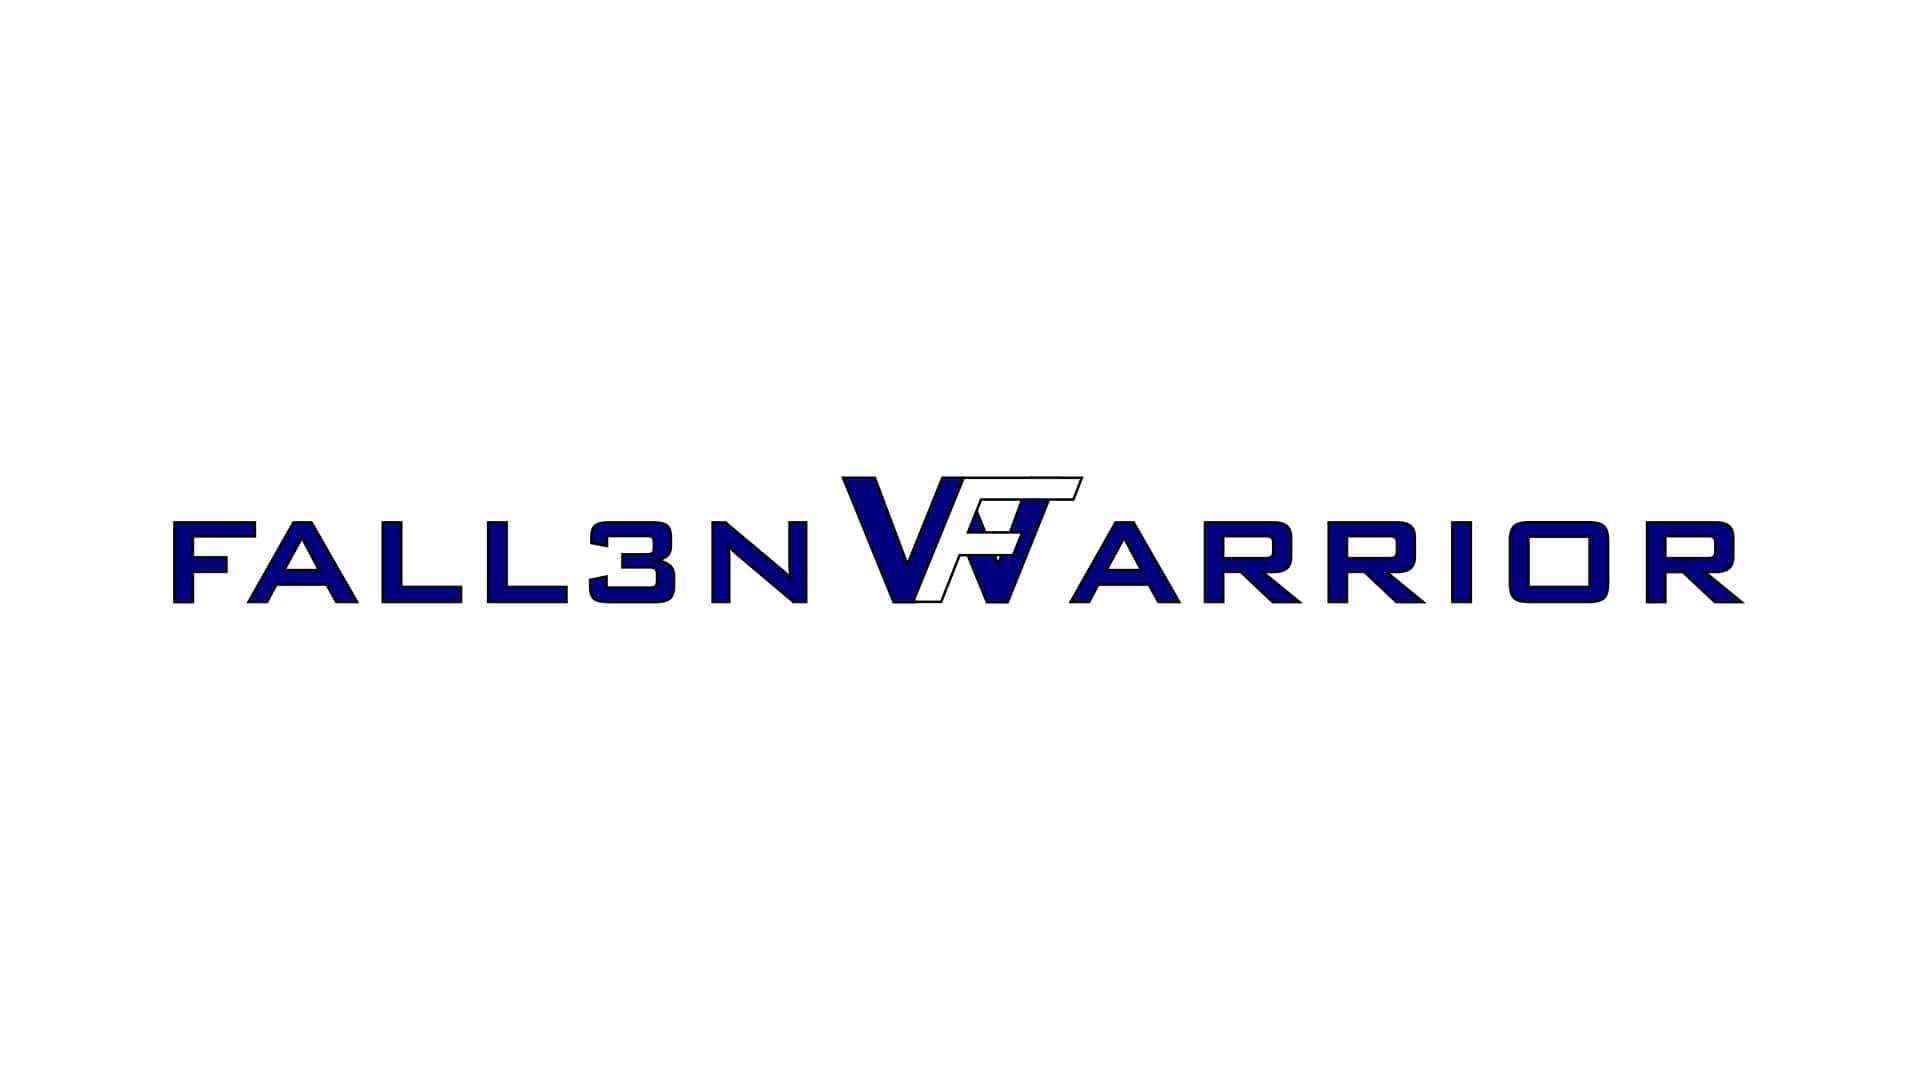 fall3nwarrior-logo